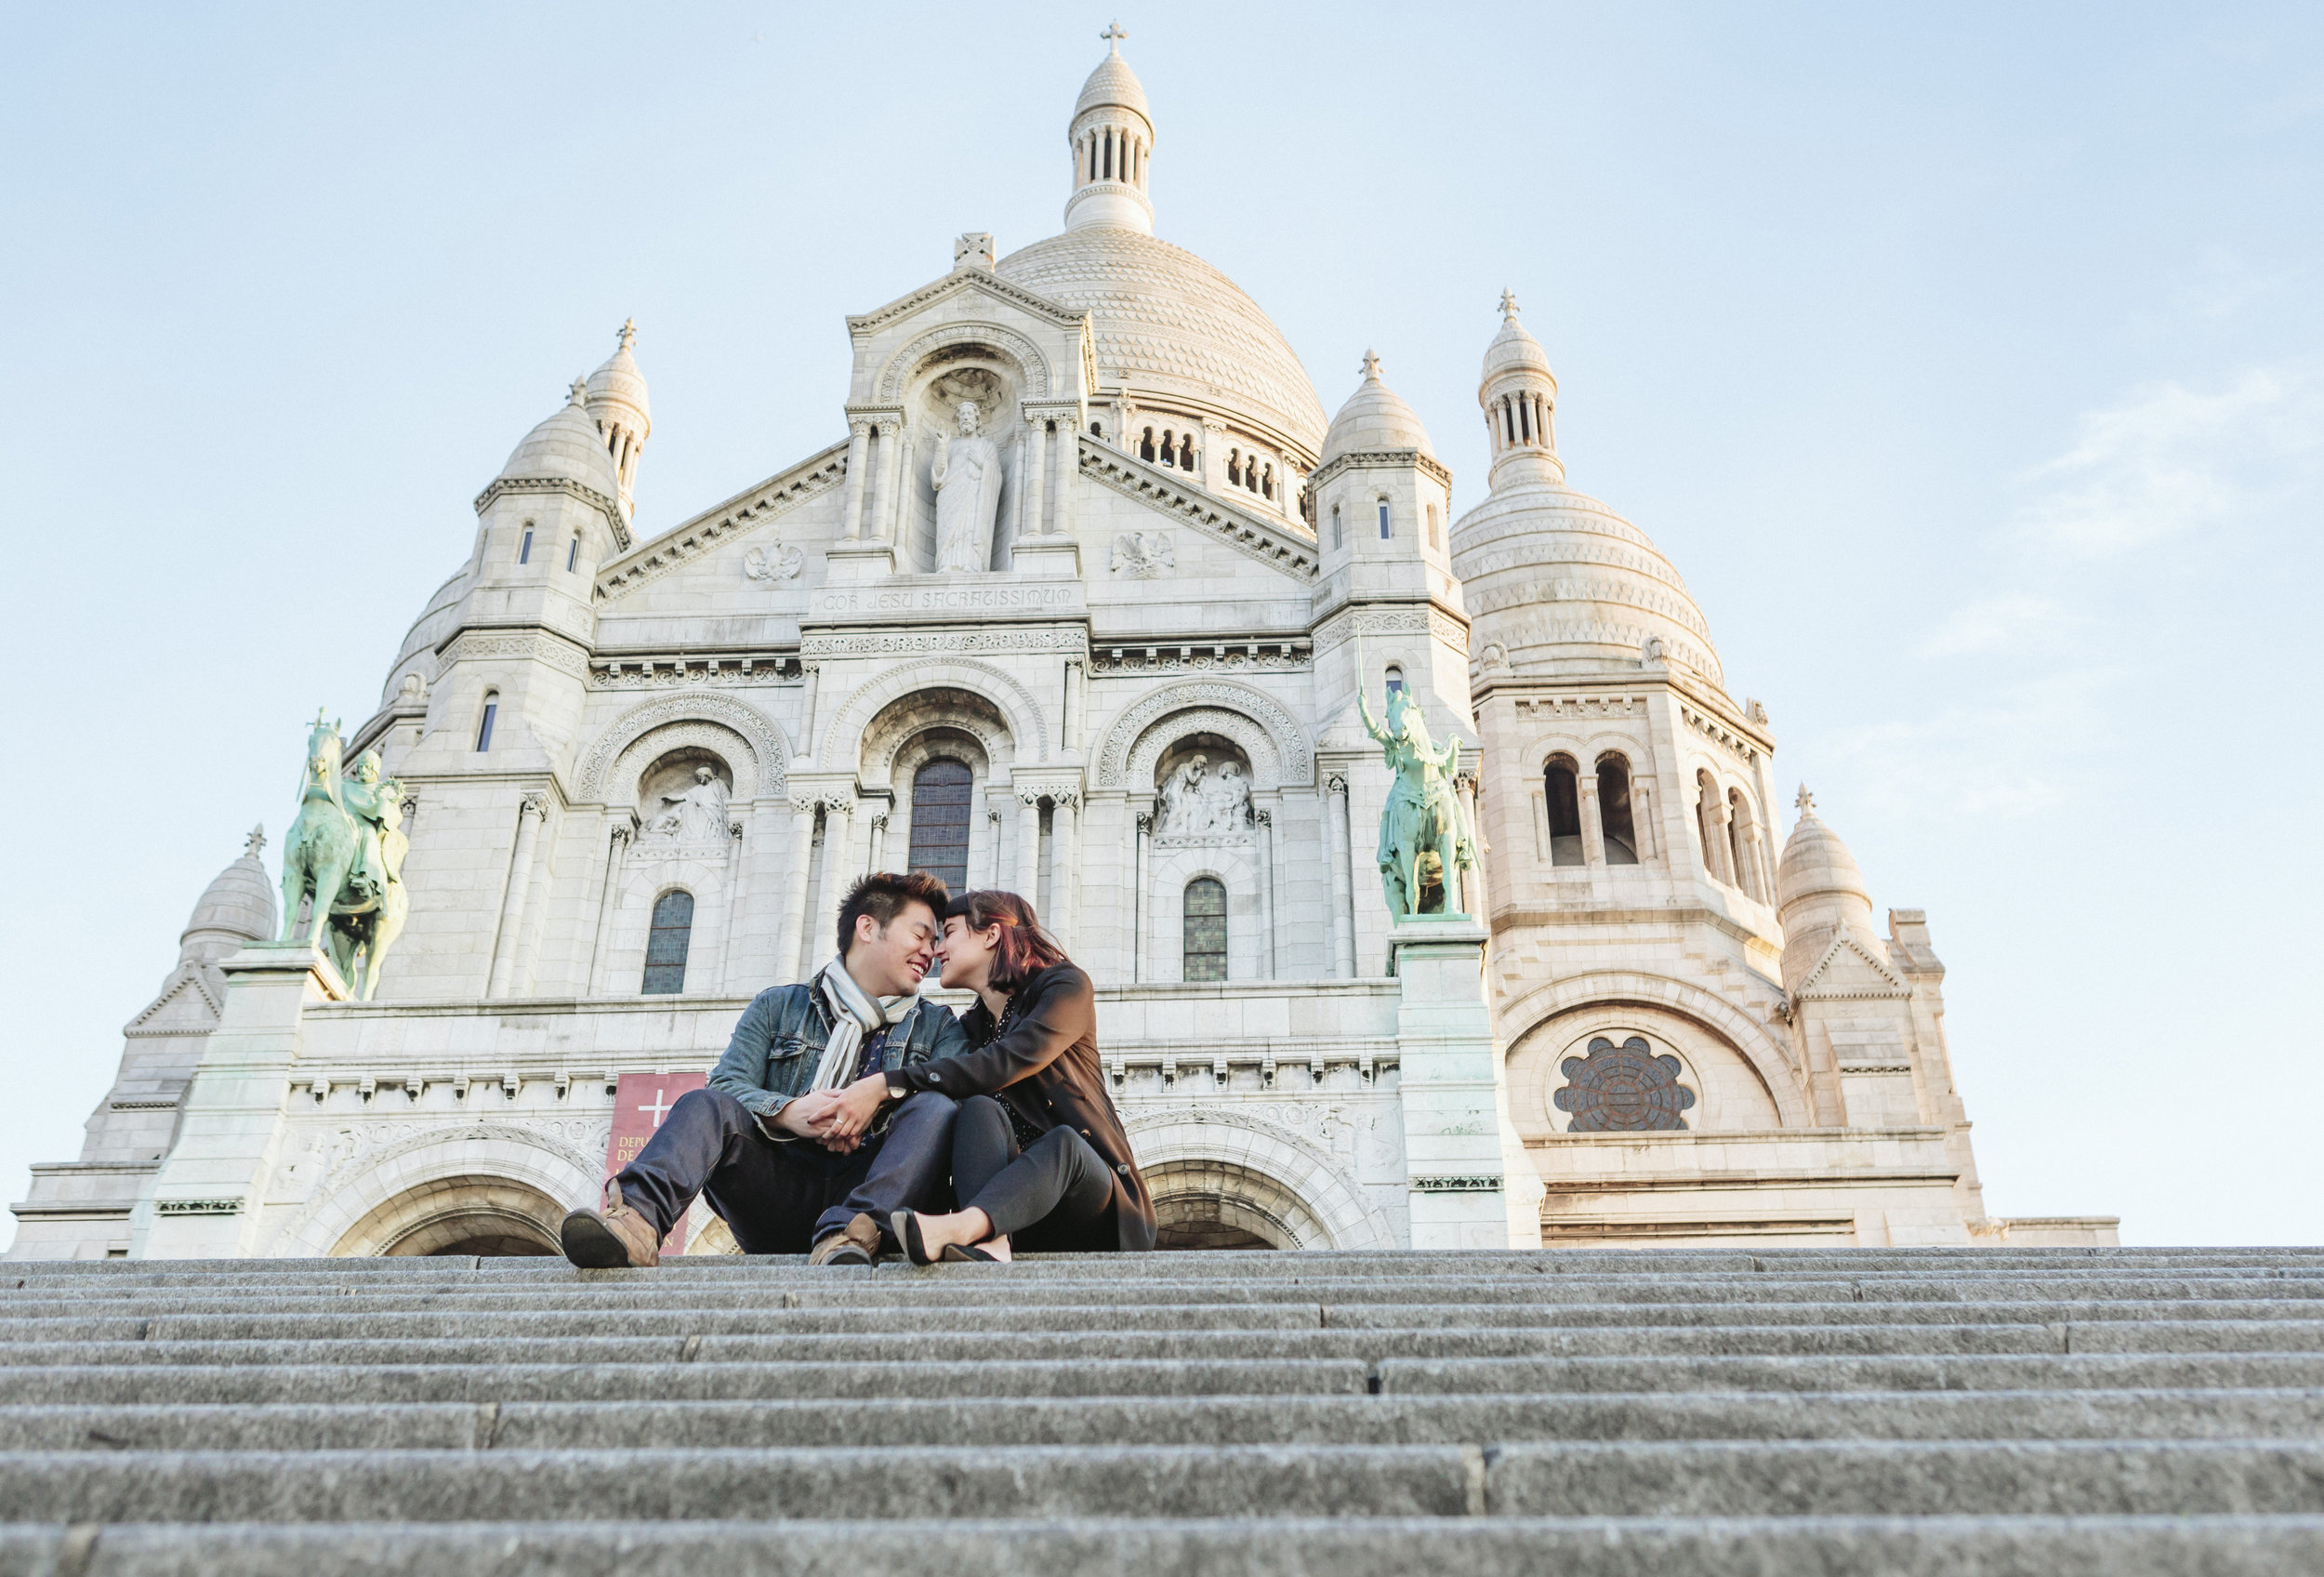 paris photographer surprise proposal couple at the steps by sacre coeur in montmartre